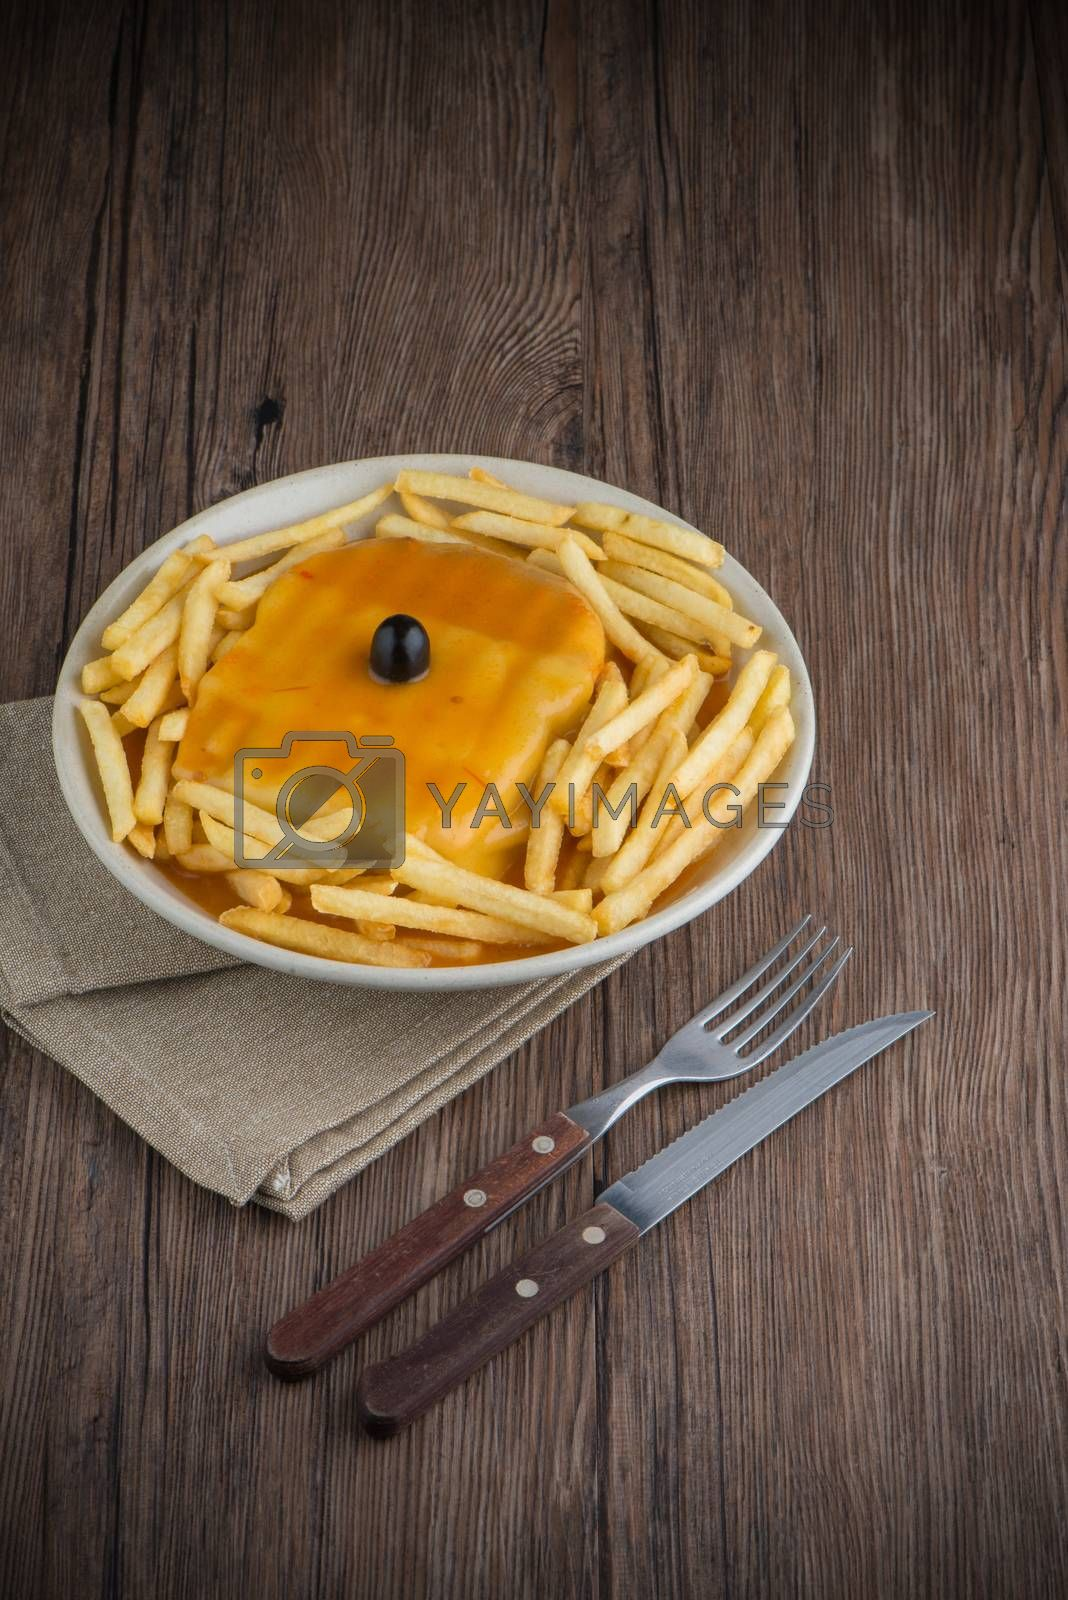 Francesinha on plate by homydesign